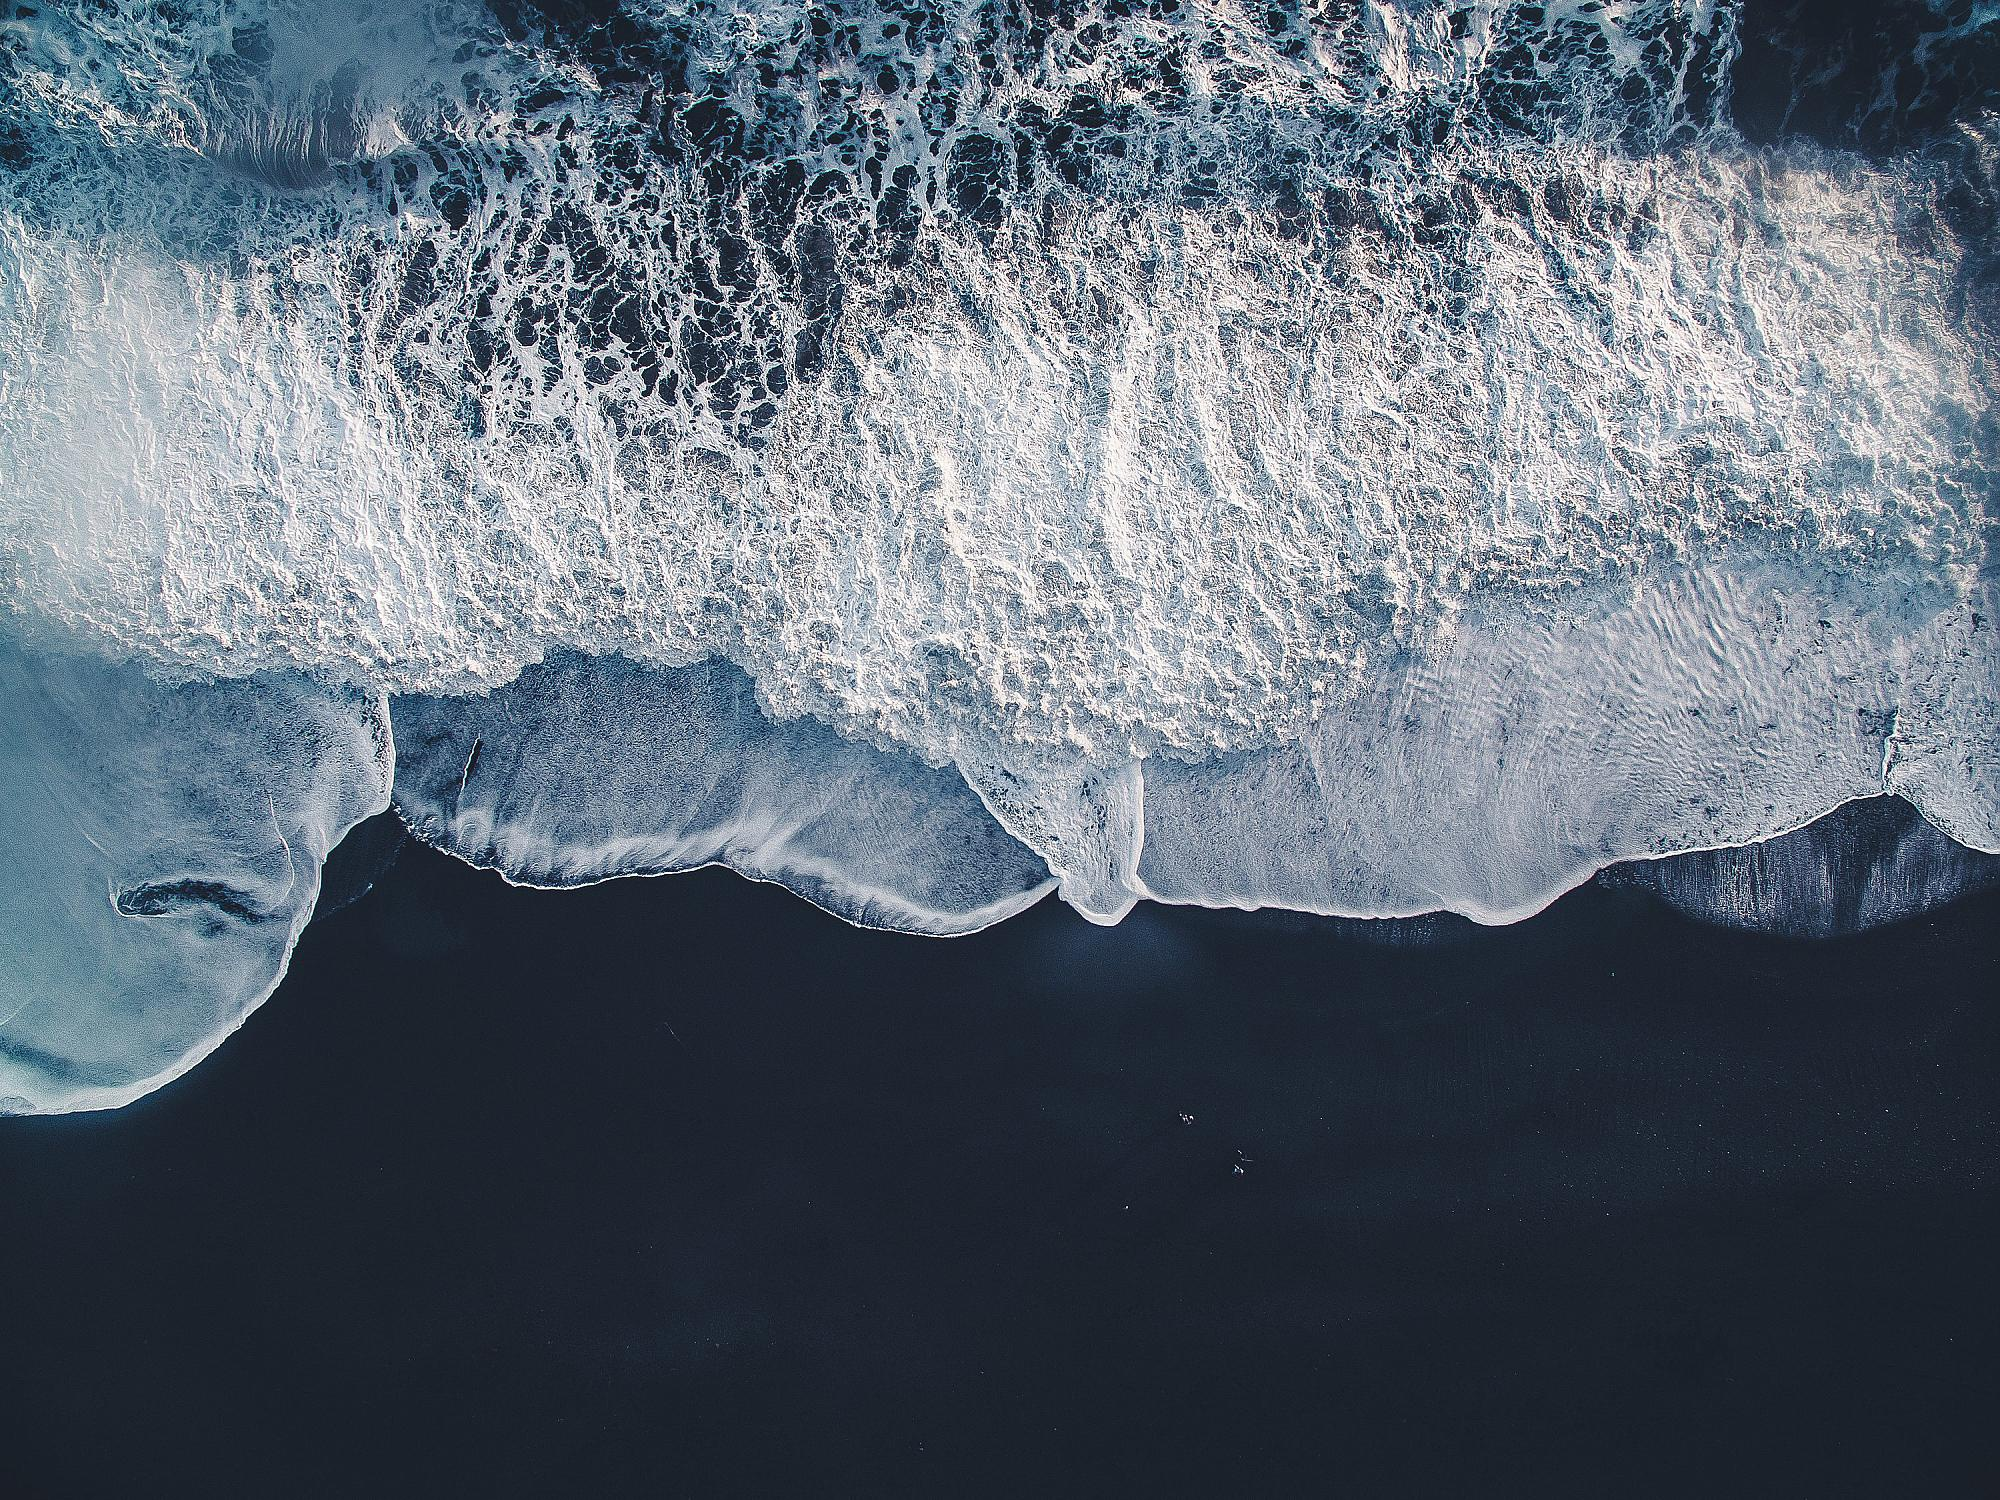 General 2000x1500 aerial view beach outdoors water black sand sea foam bird's eye view